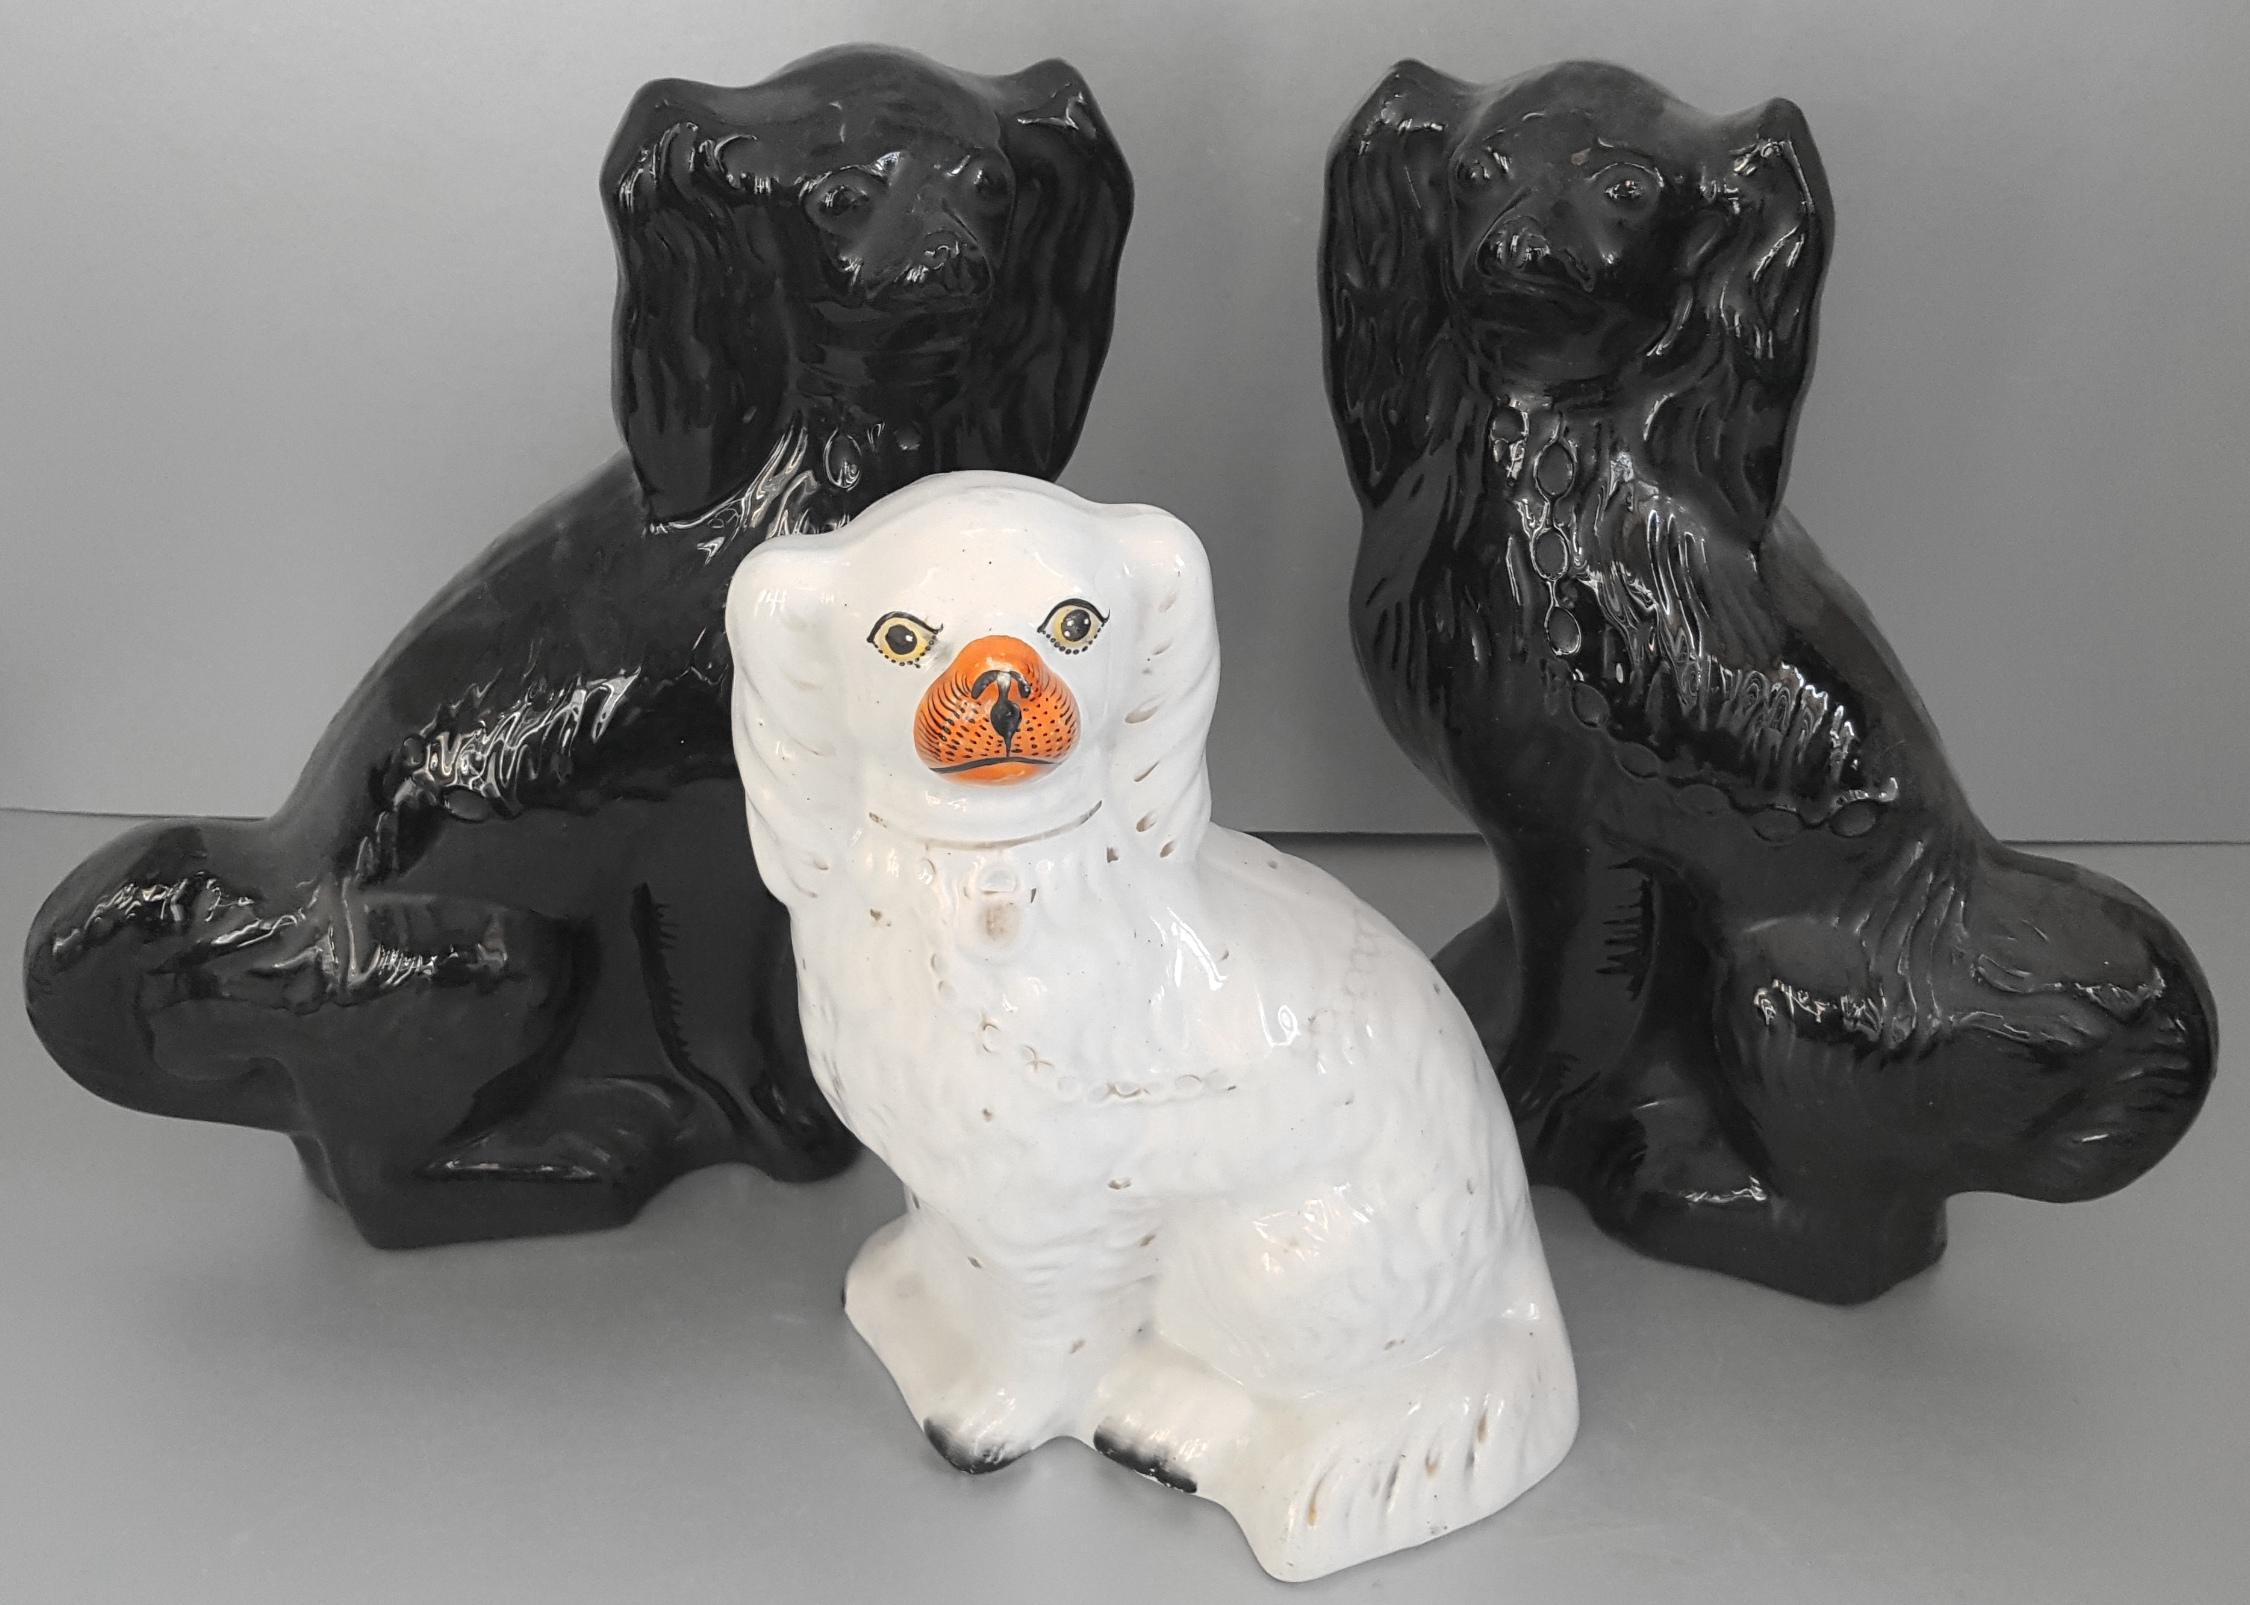 Lot 31 - Vintage Retro 3 x Ceramic Staffordshire Dog Figures NO RESERVE